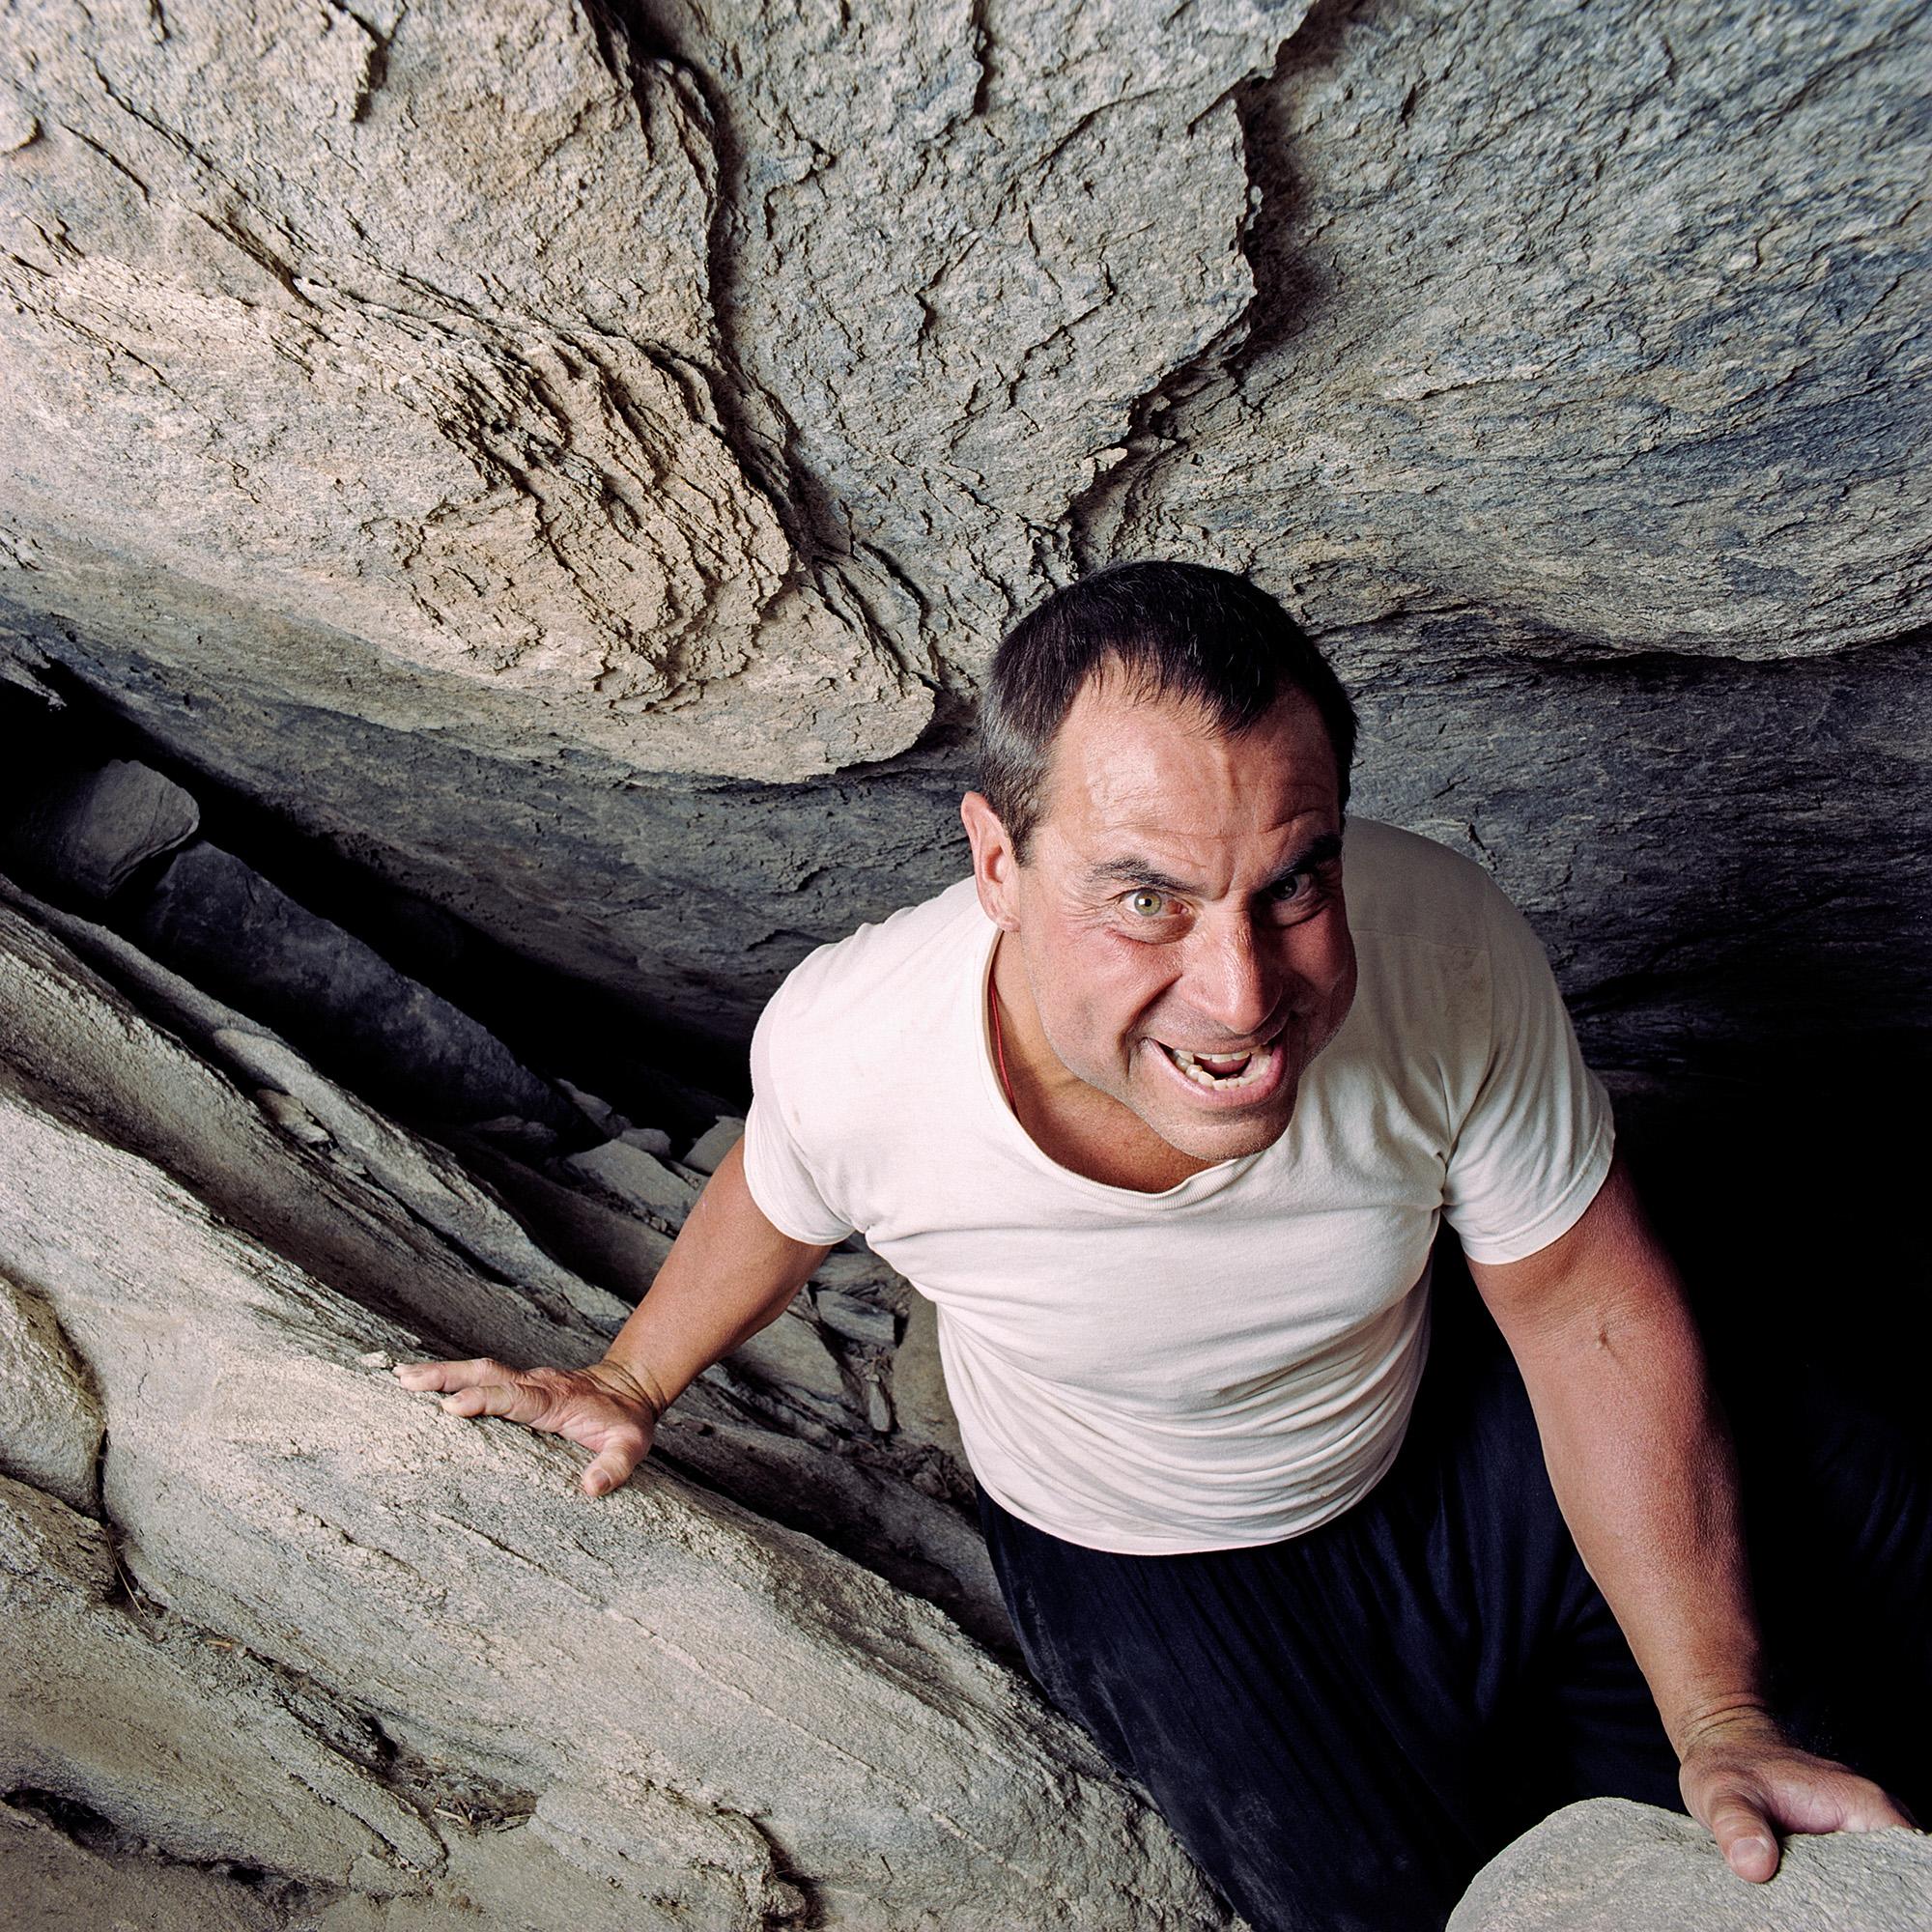 Photographing Benny Podda, the Bodybuilder Turned Martial Artist ...